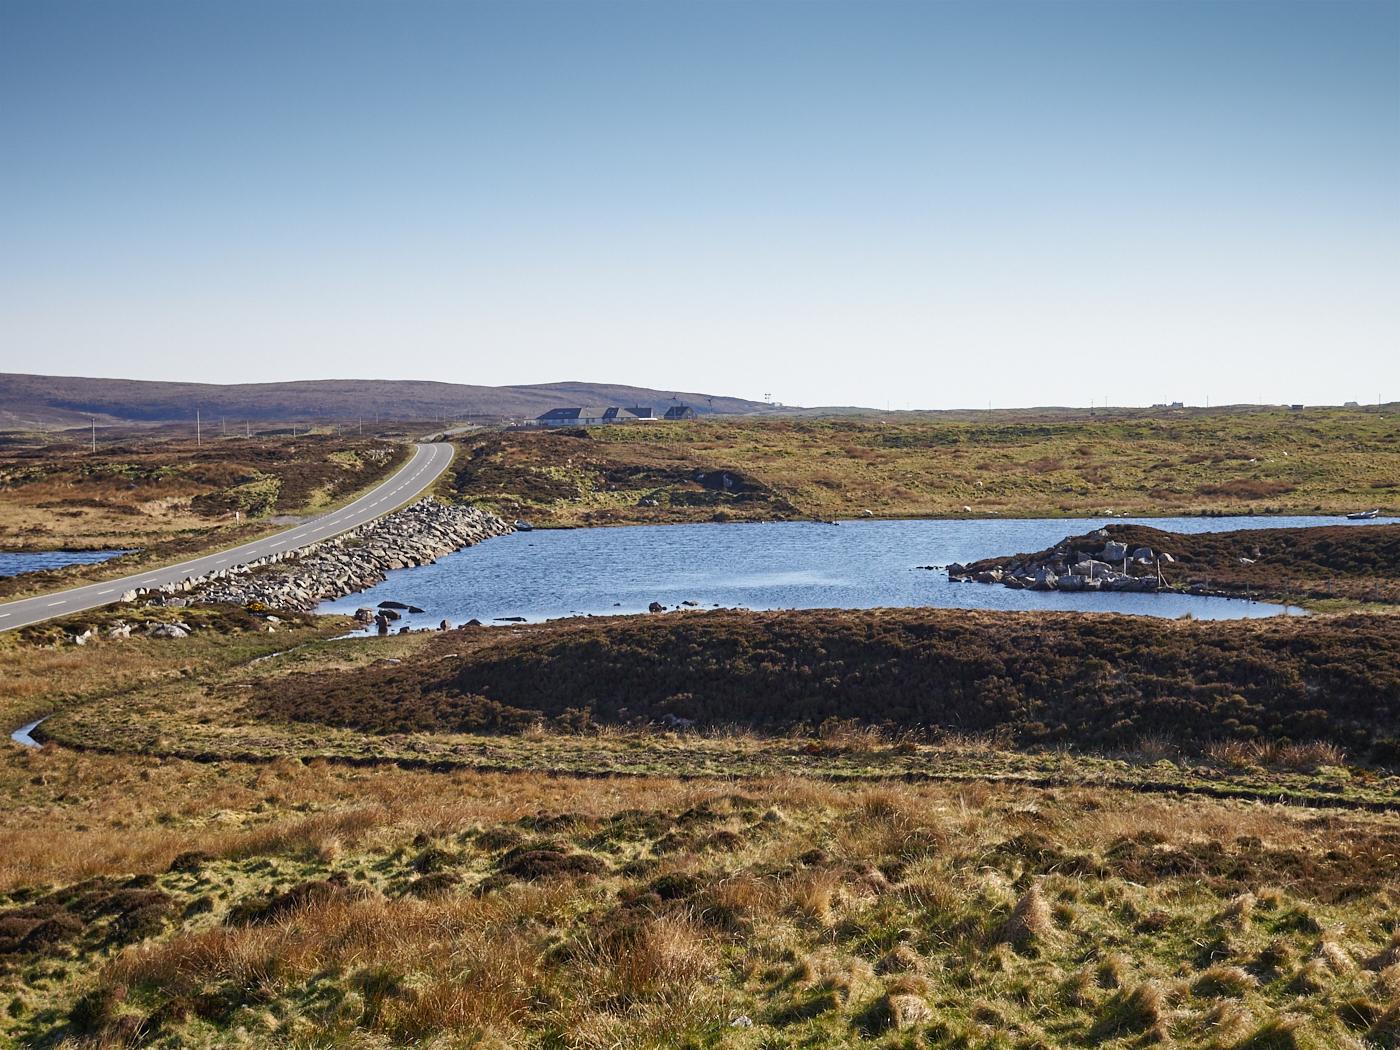 Loch Ollay causeway. Mark Farrington, 2016